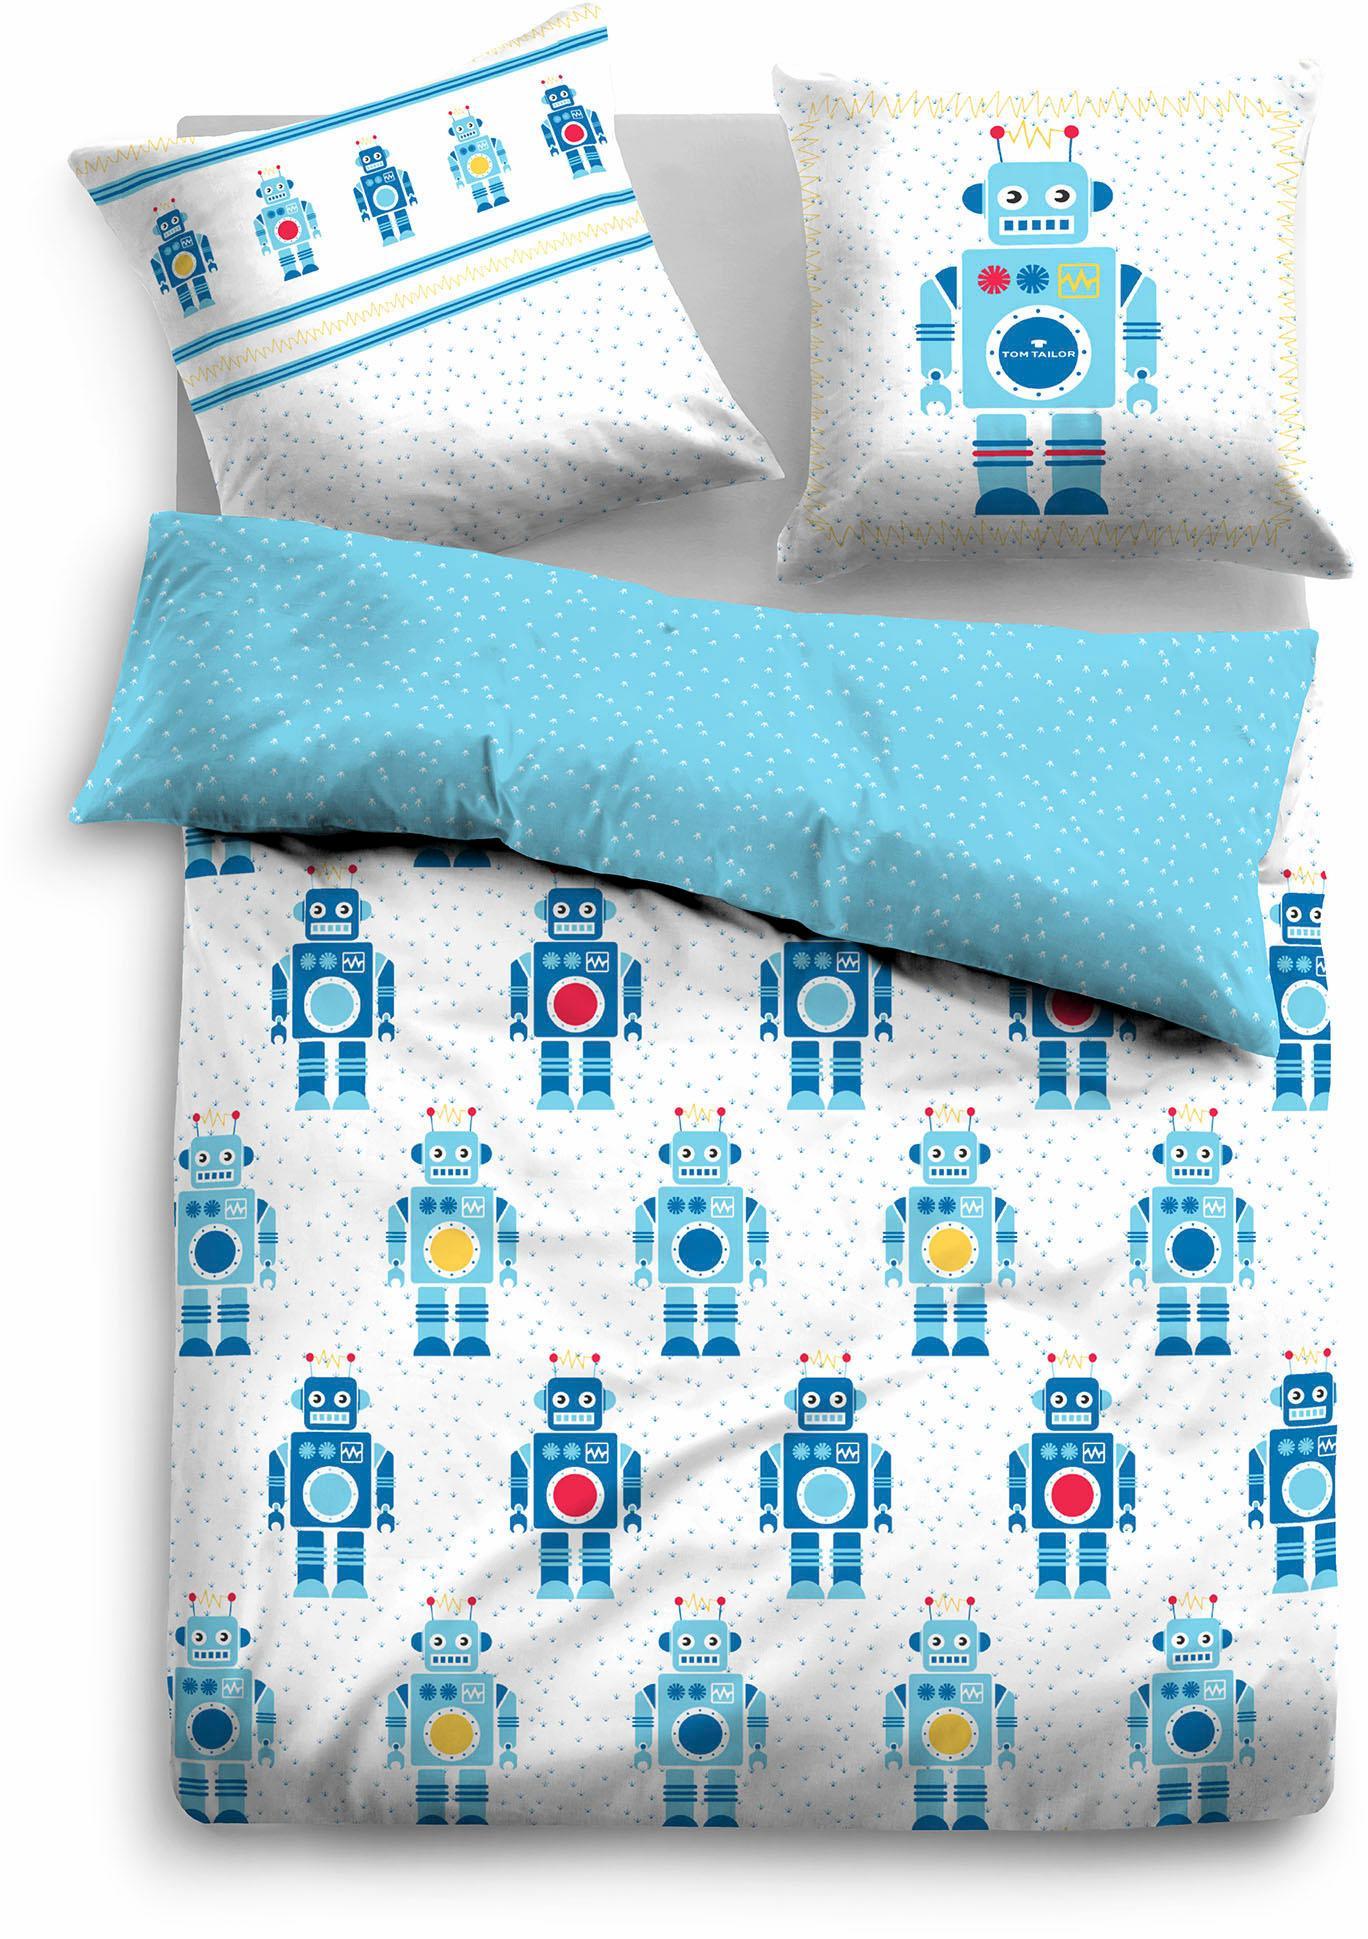 Kinderbettwäsche »Beni«, TOM TAILOR | Kinderzimmer > Textilien für Kinder > Kinderbettwäsche | Blau | Baumwolle | Tom Tailor